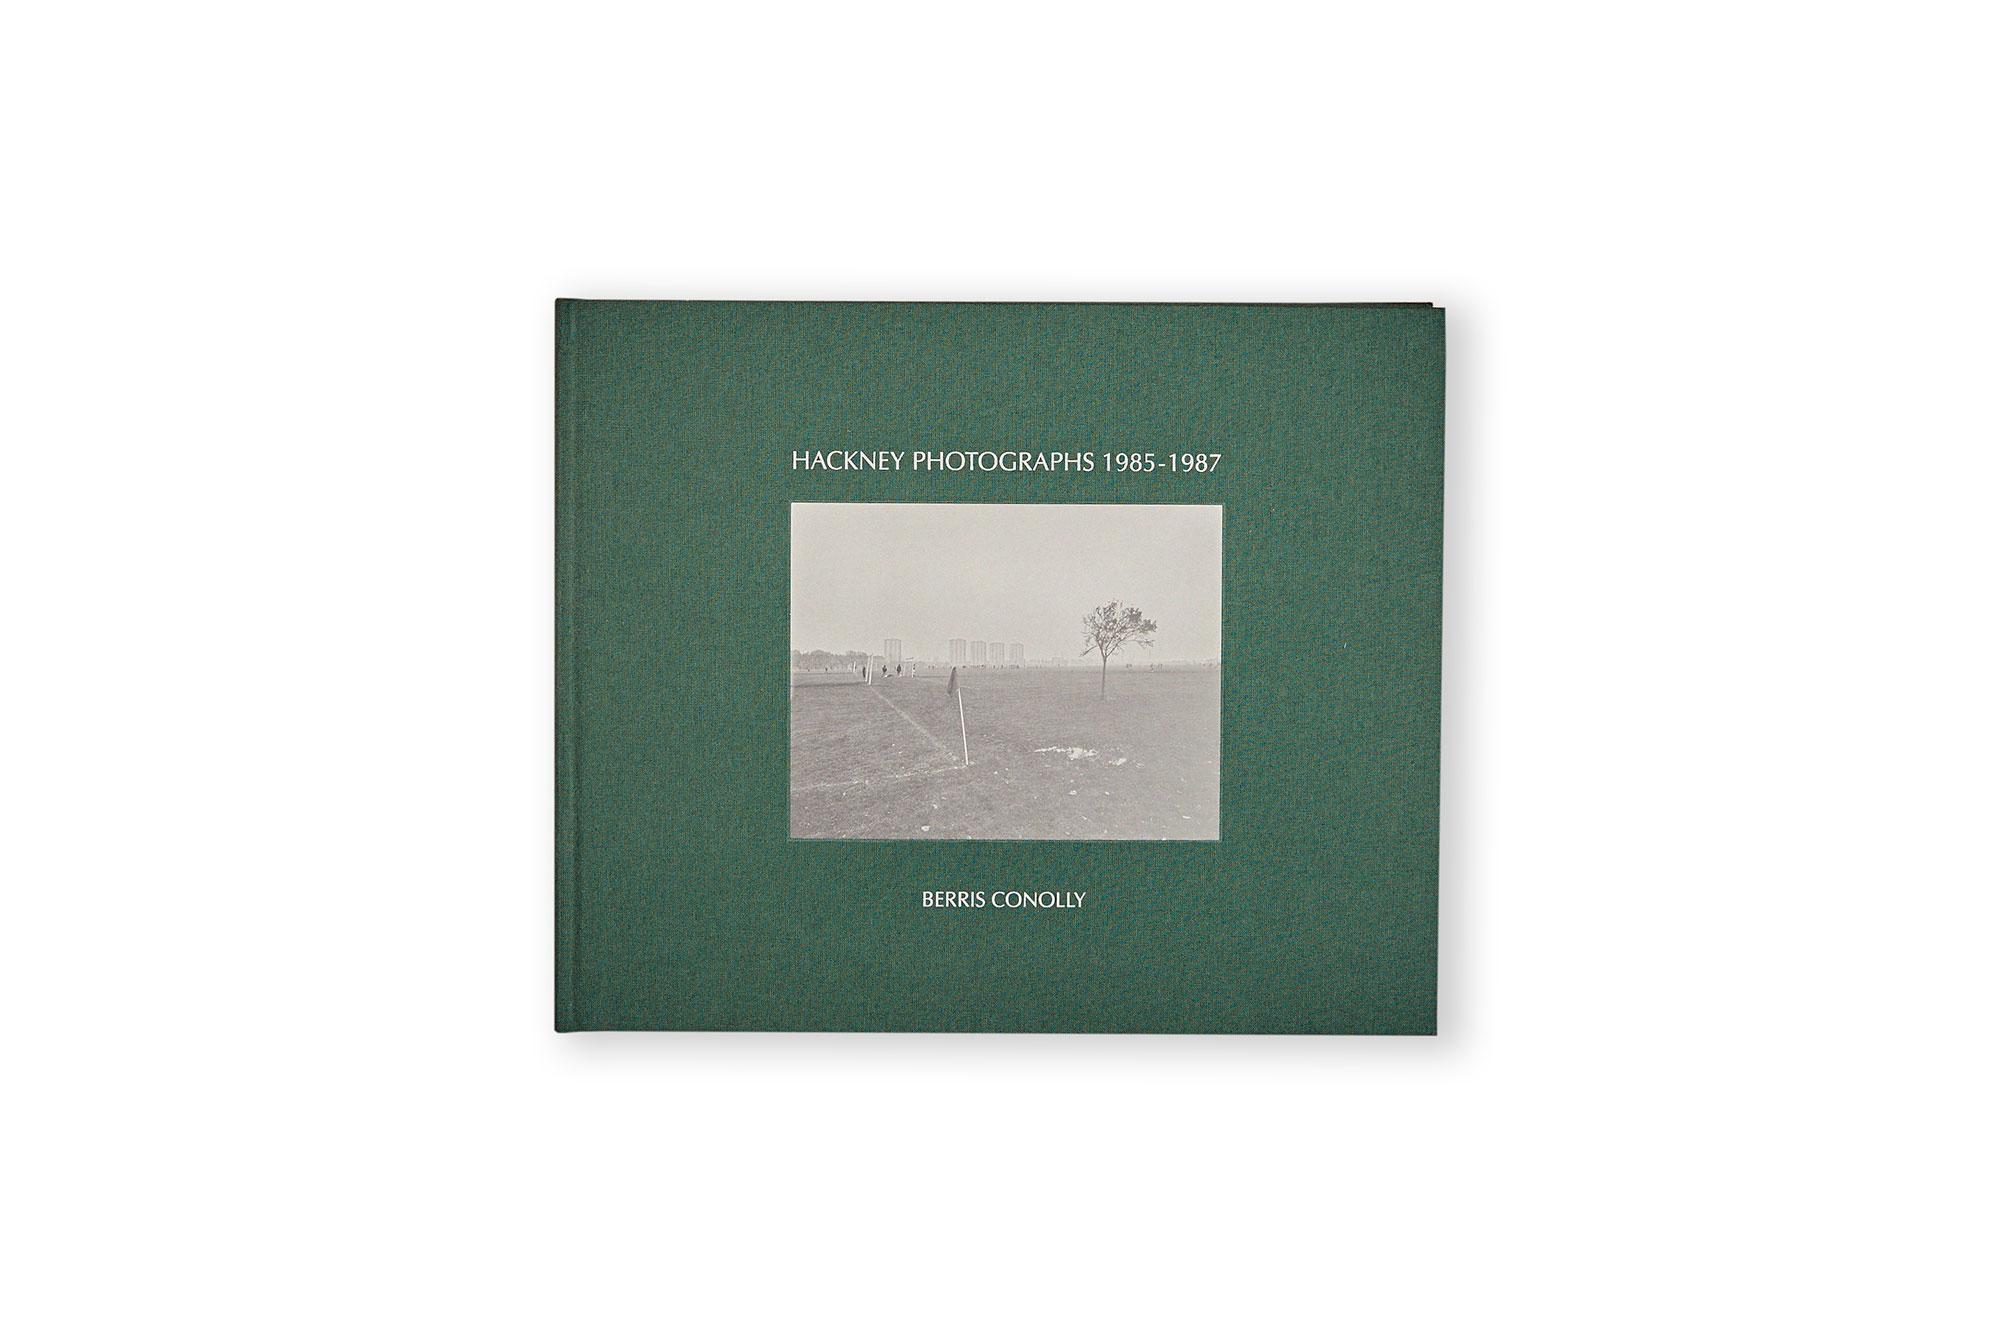 HACKNEY PHOTOGRAPHS 1985-1987, berris conolly.